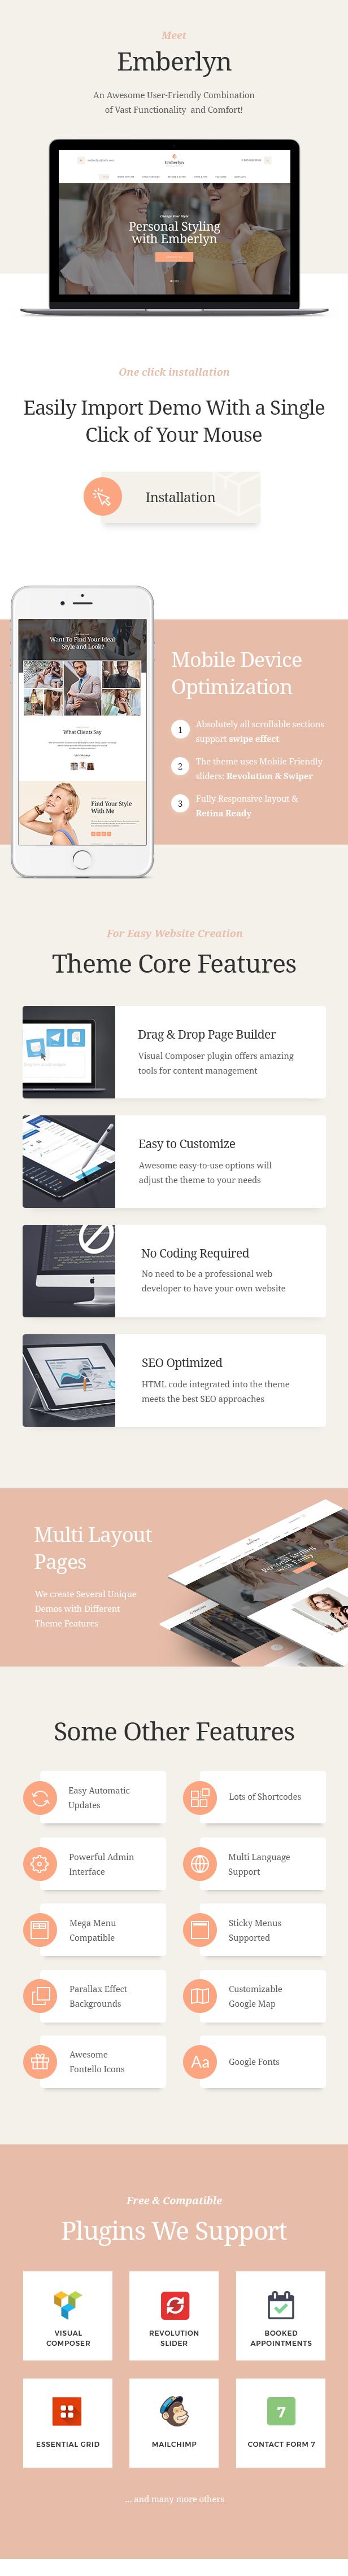 Emberlyn | Personal Stylist WordPress Theme - 1